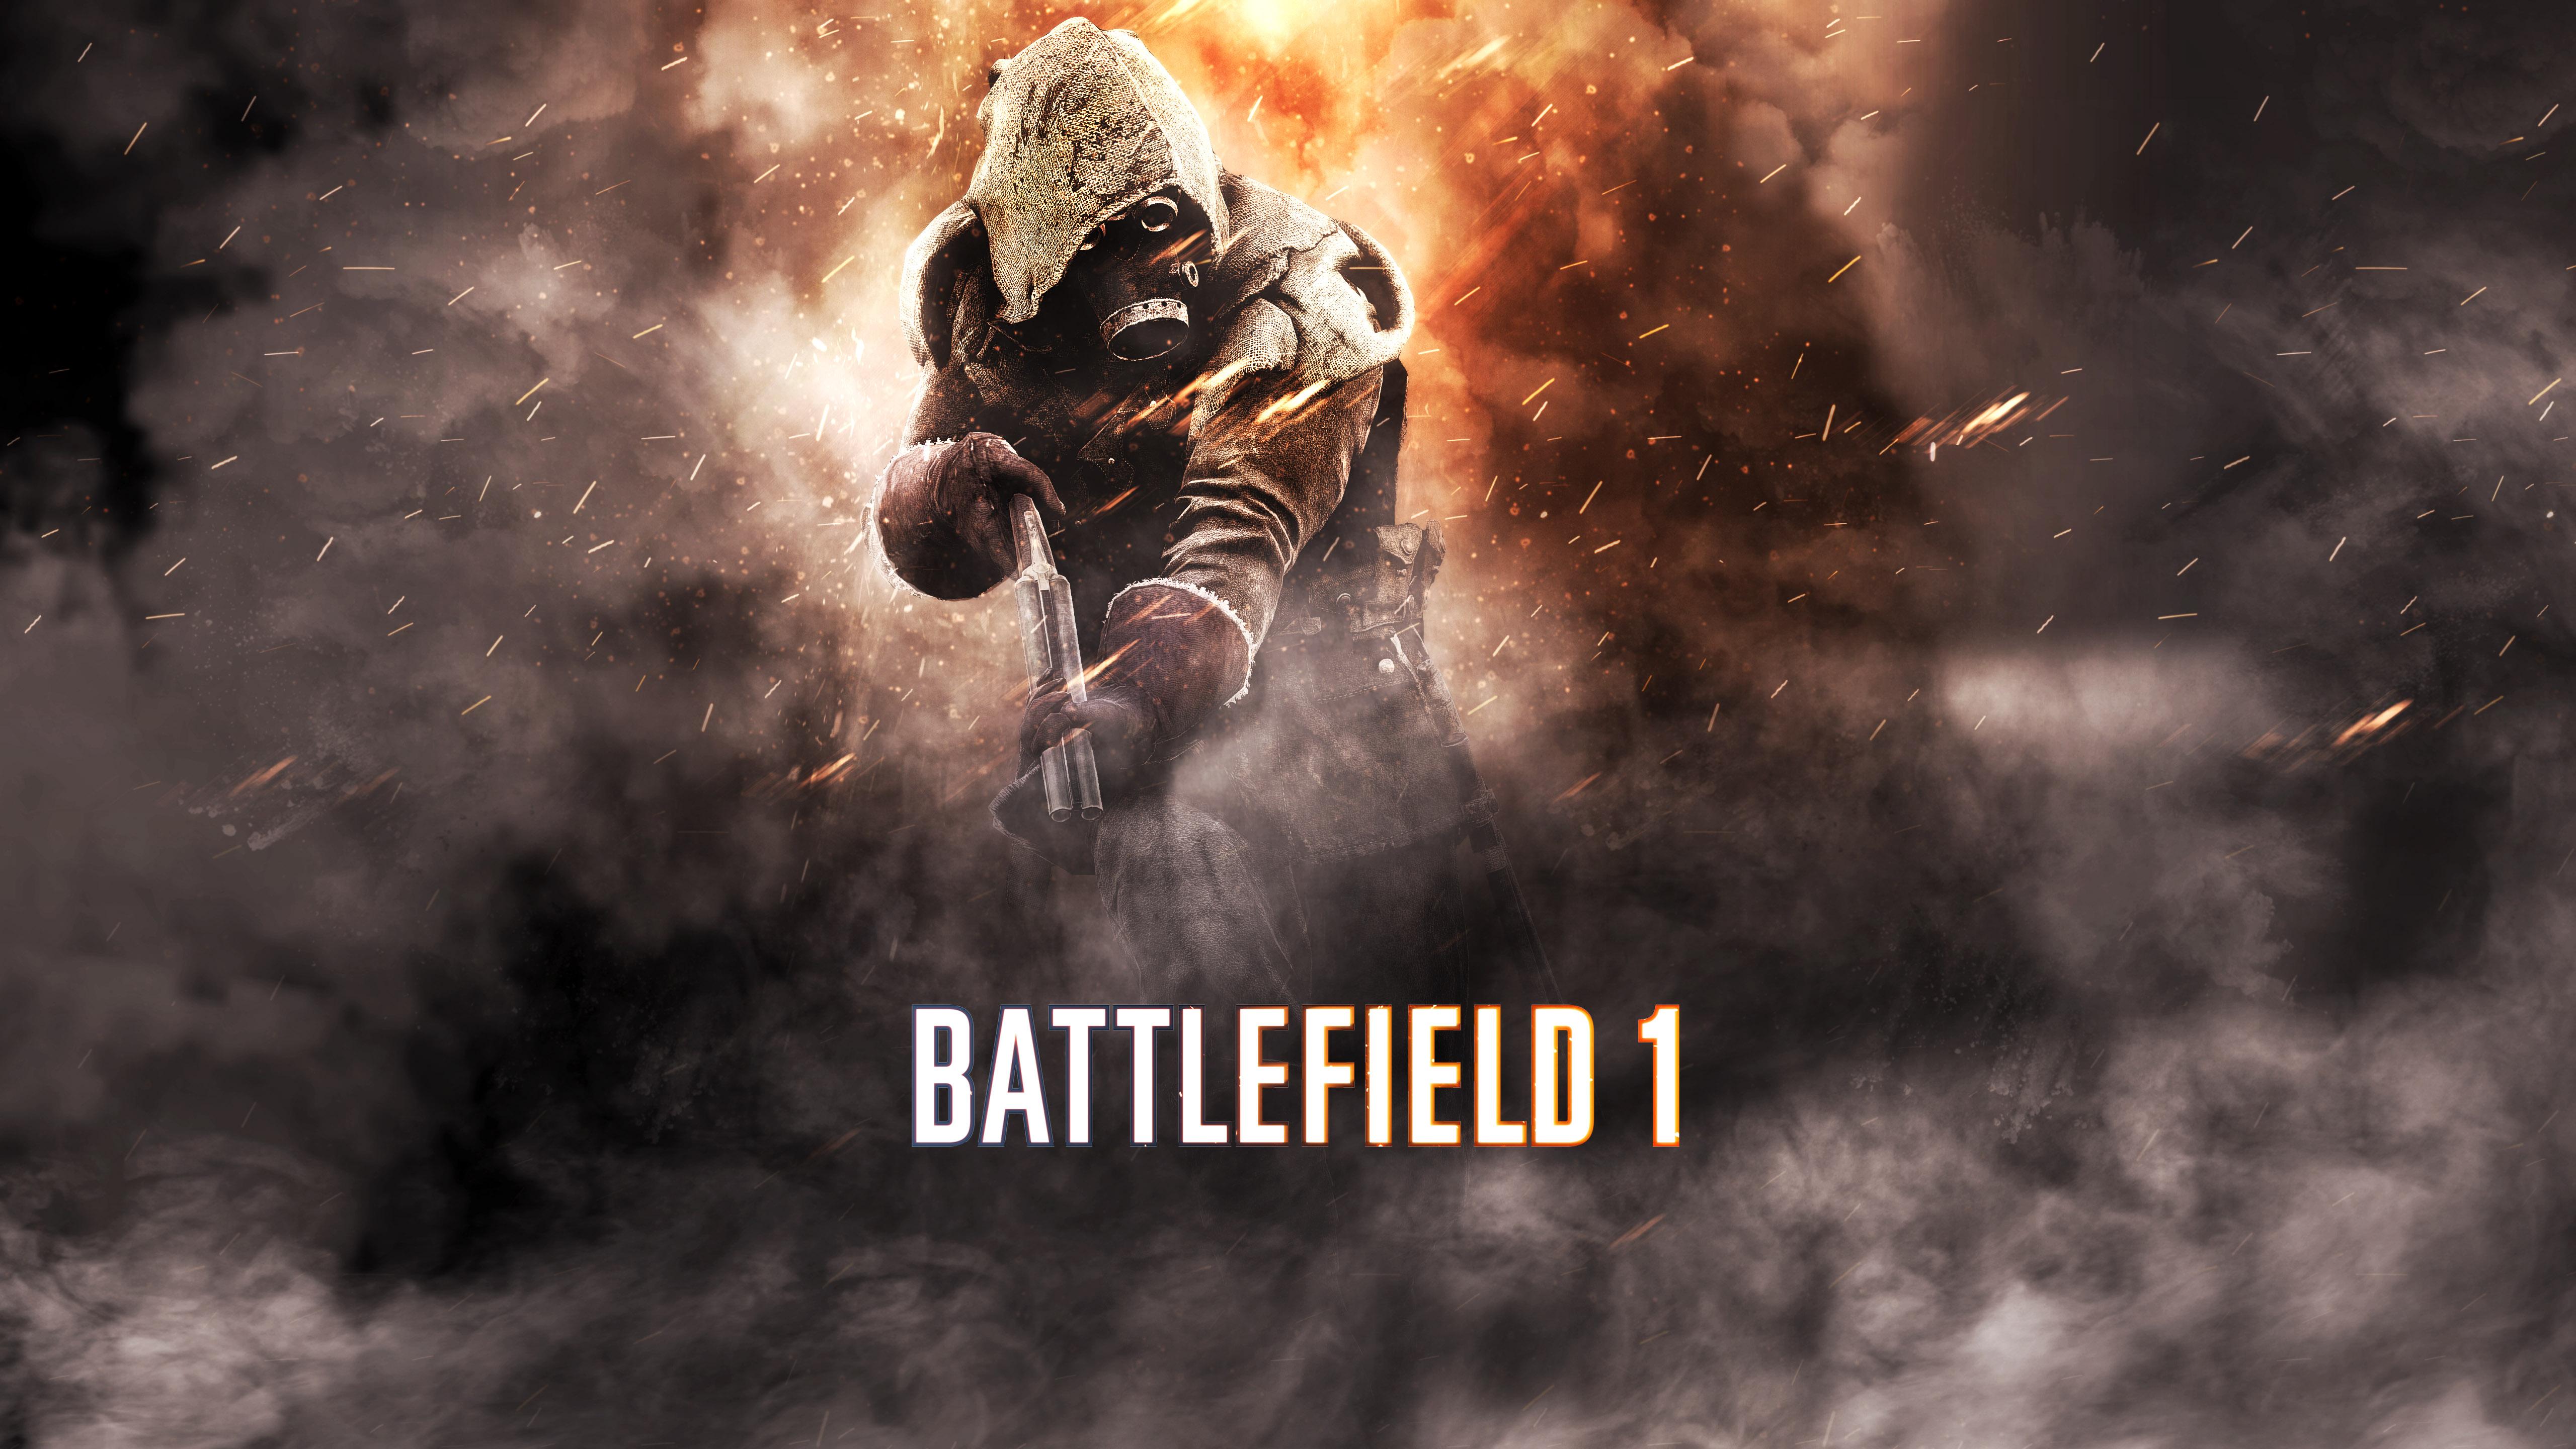 2560x1440 Battlefield 1 Video Game 4k 1440P Resolution HD